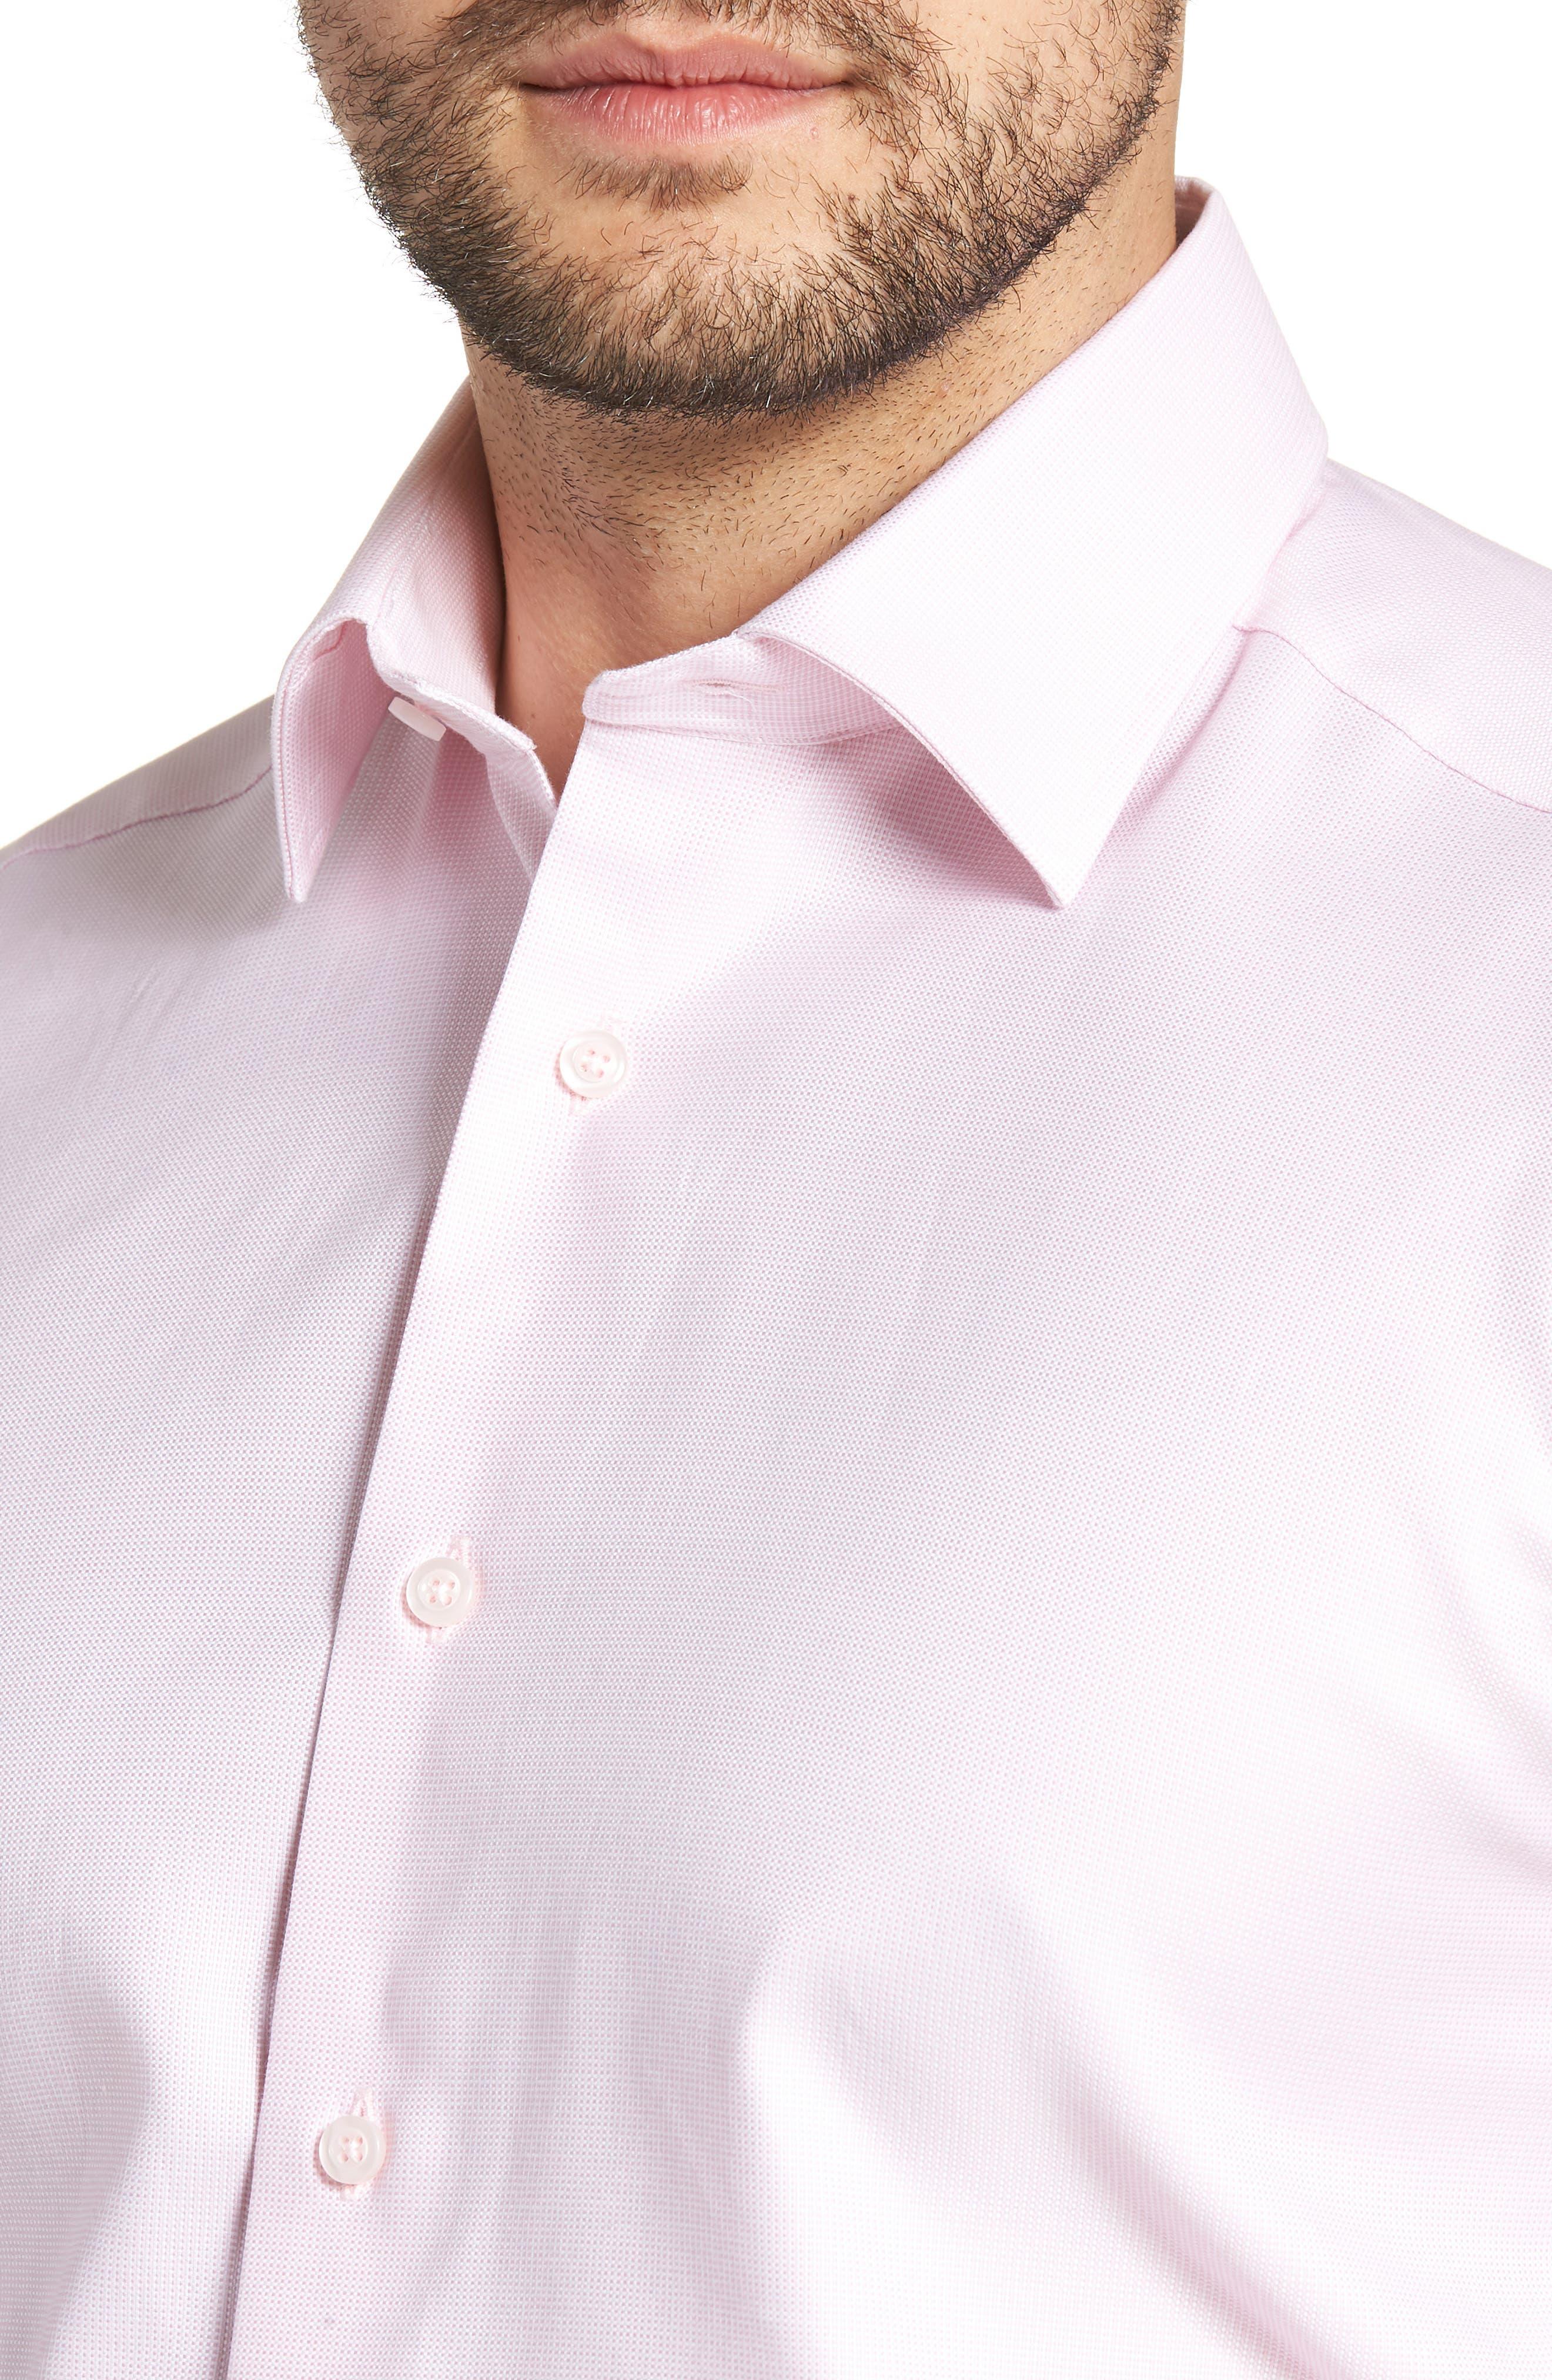 Regular Fit Solid Dress Shirt,                             Alternate thumbnail 2, color,                             Pink